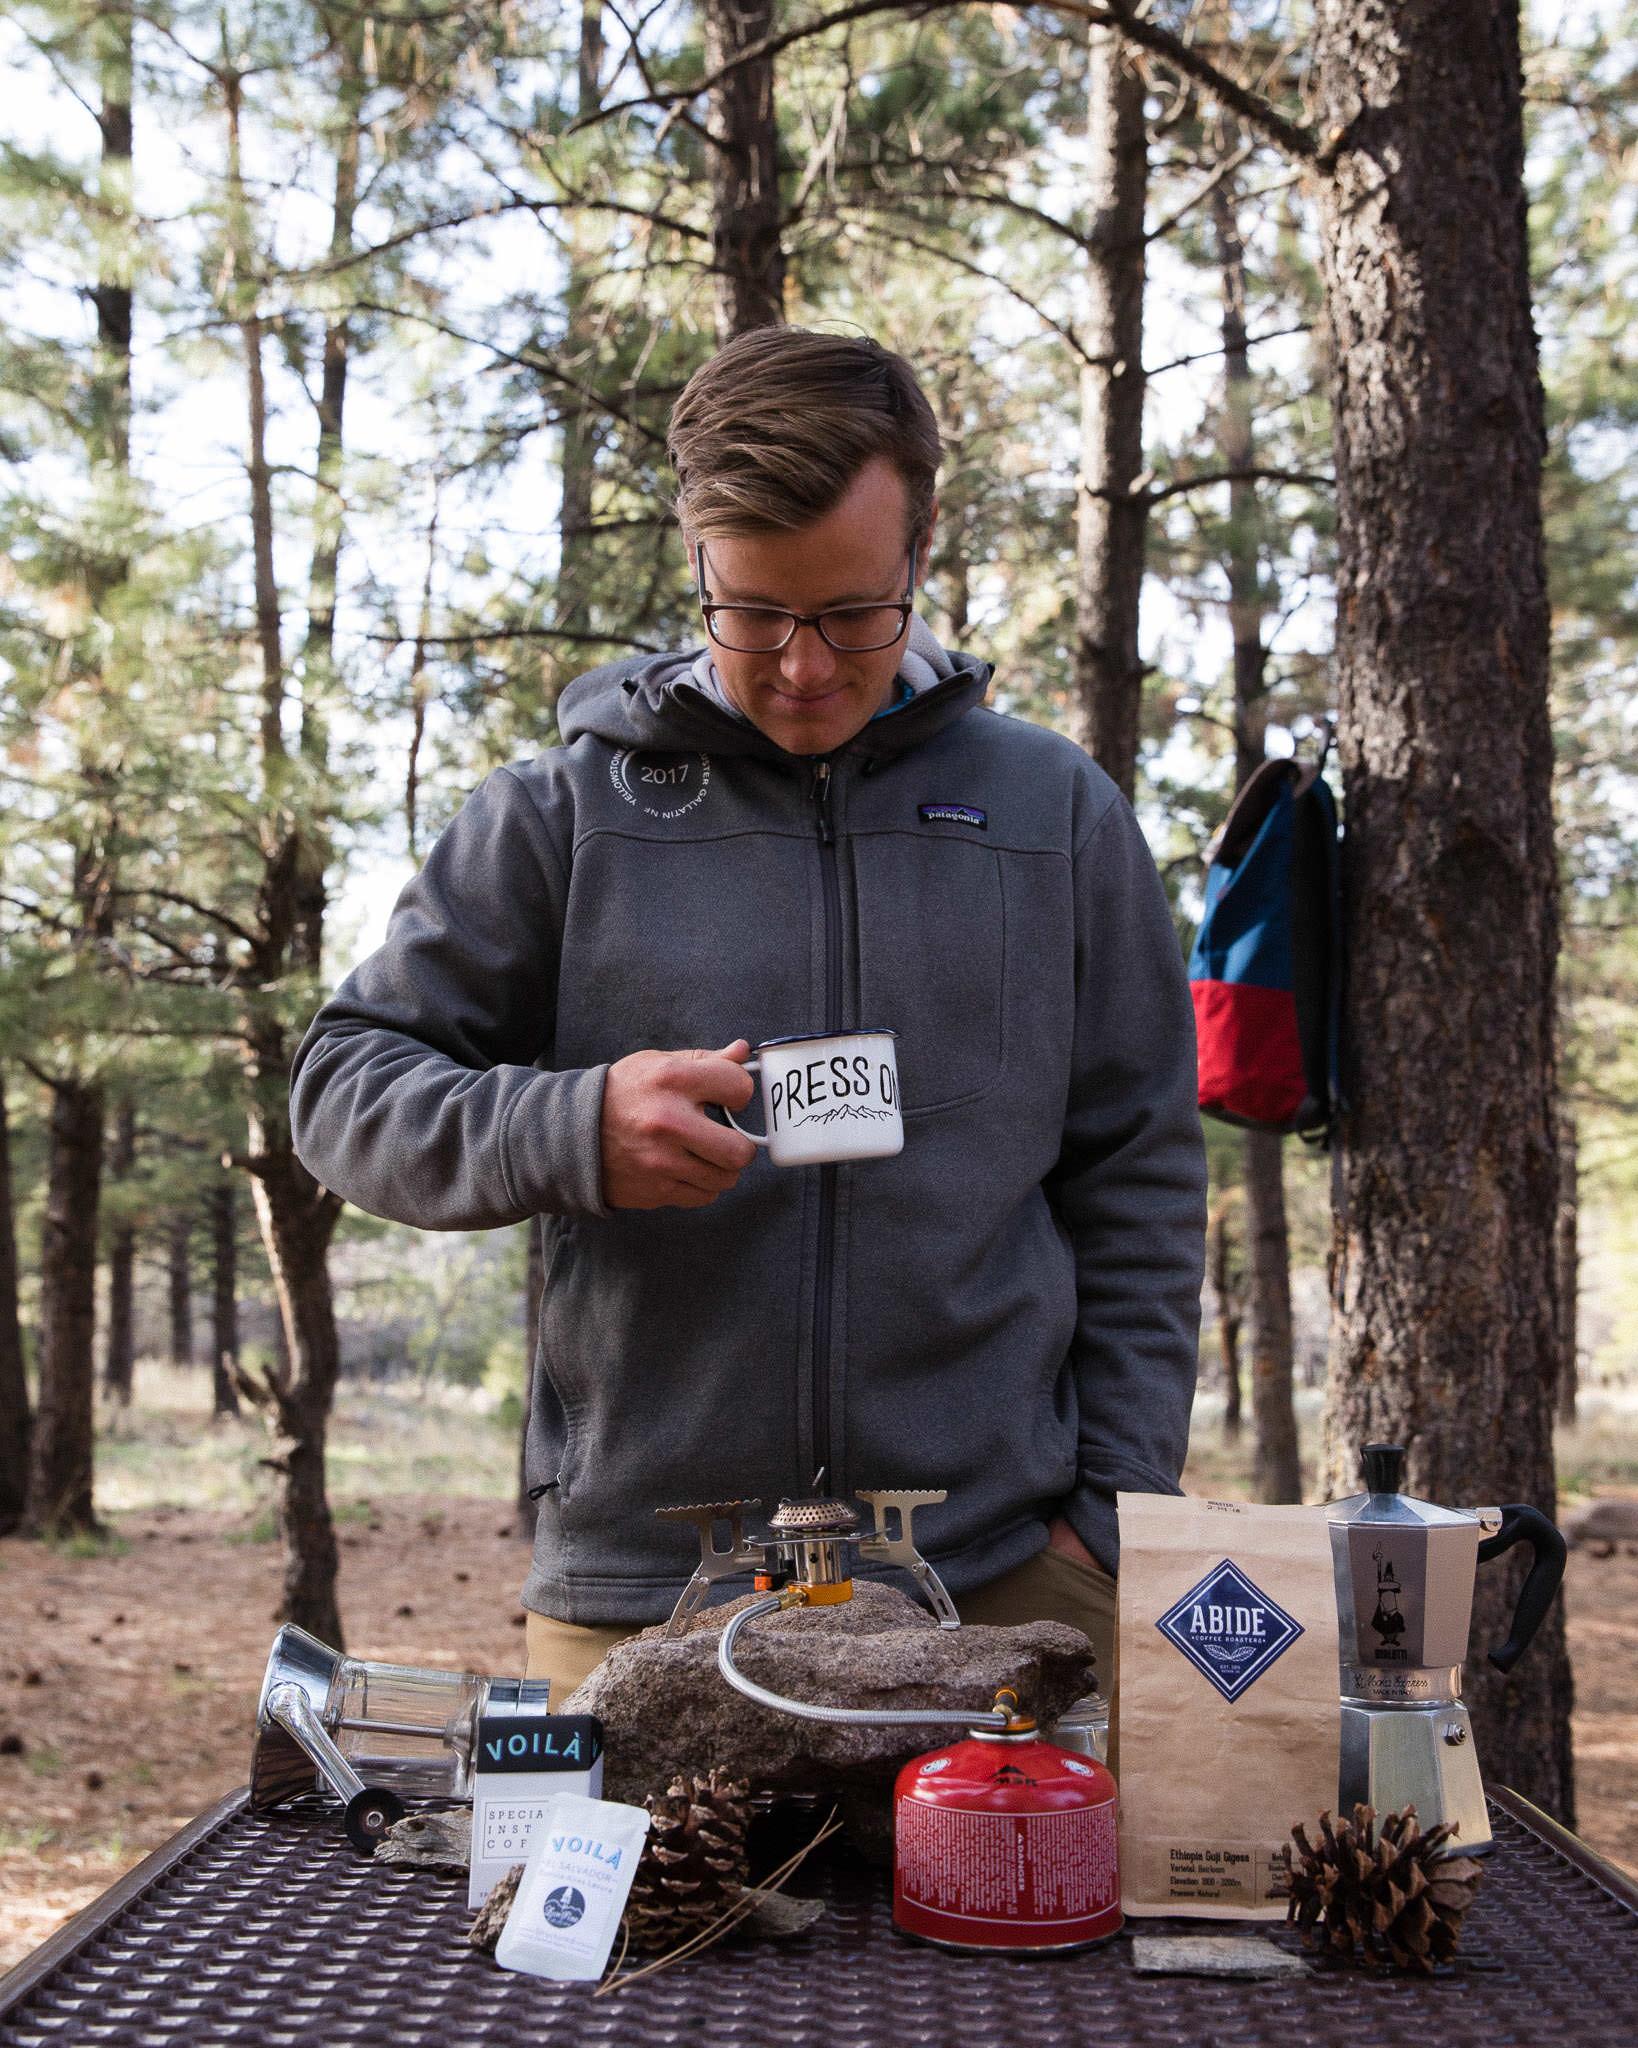 Camp coffee made in a Moka Pot on a butane burner in Pine Valley Utah